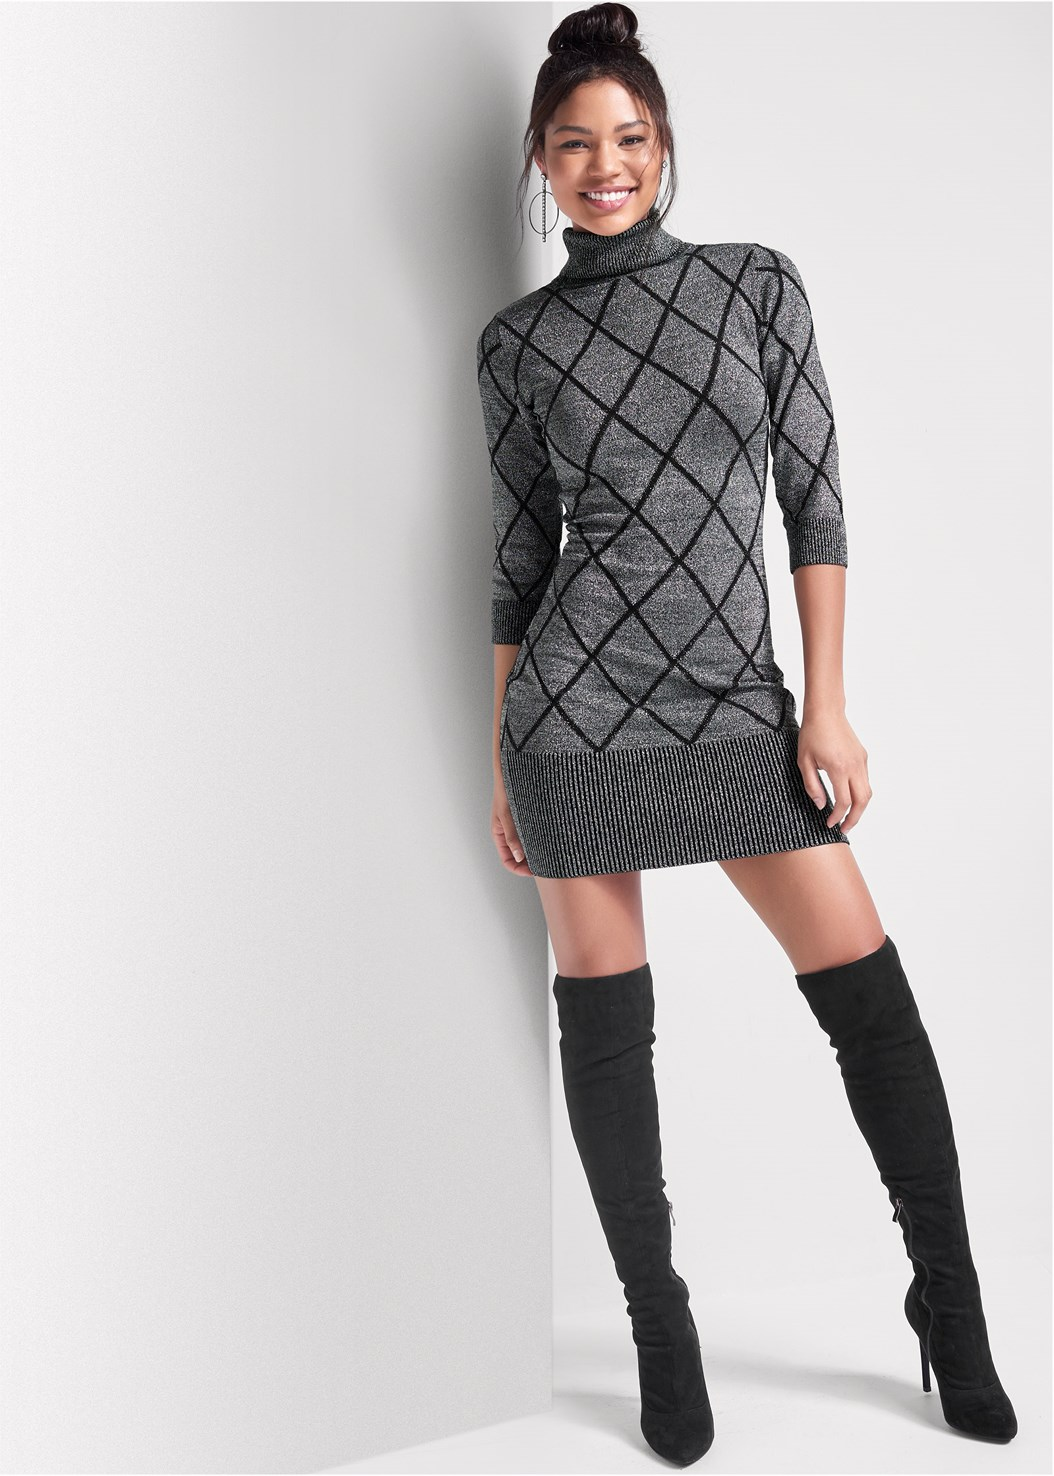 Turtleneck Sweater Dress,Naked T-Shirt Bra,Cut Out Detail Boots,Block Heel Boots,Tie Back Boots